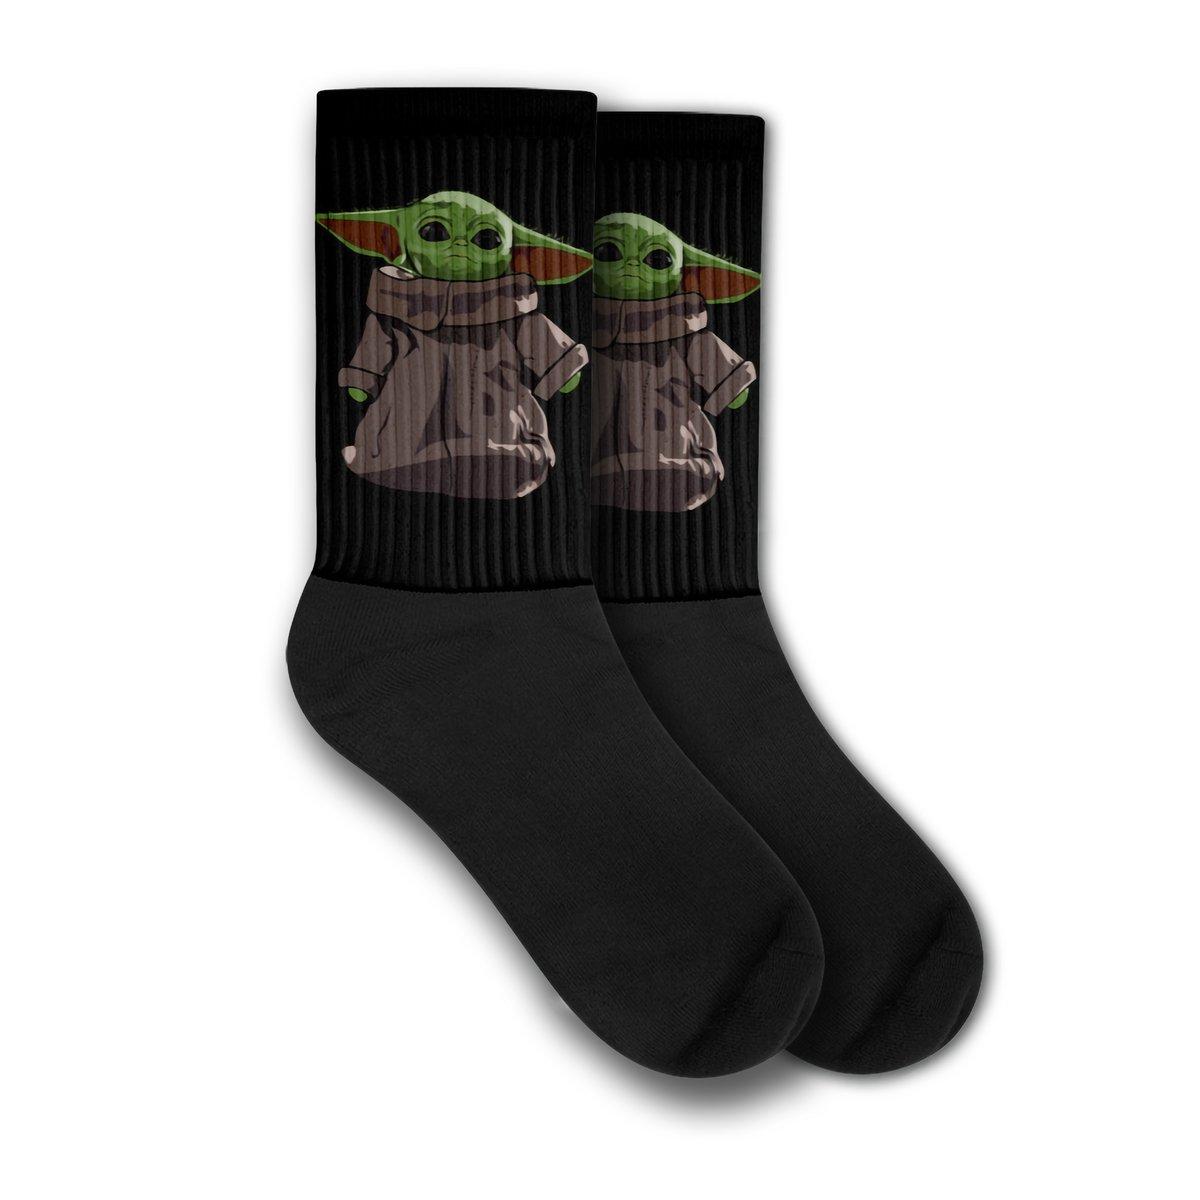 Image of Baby Yoda Socks Standing